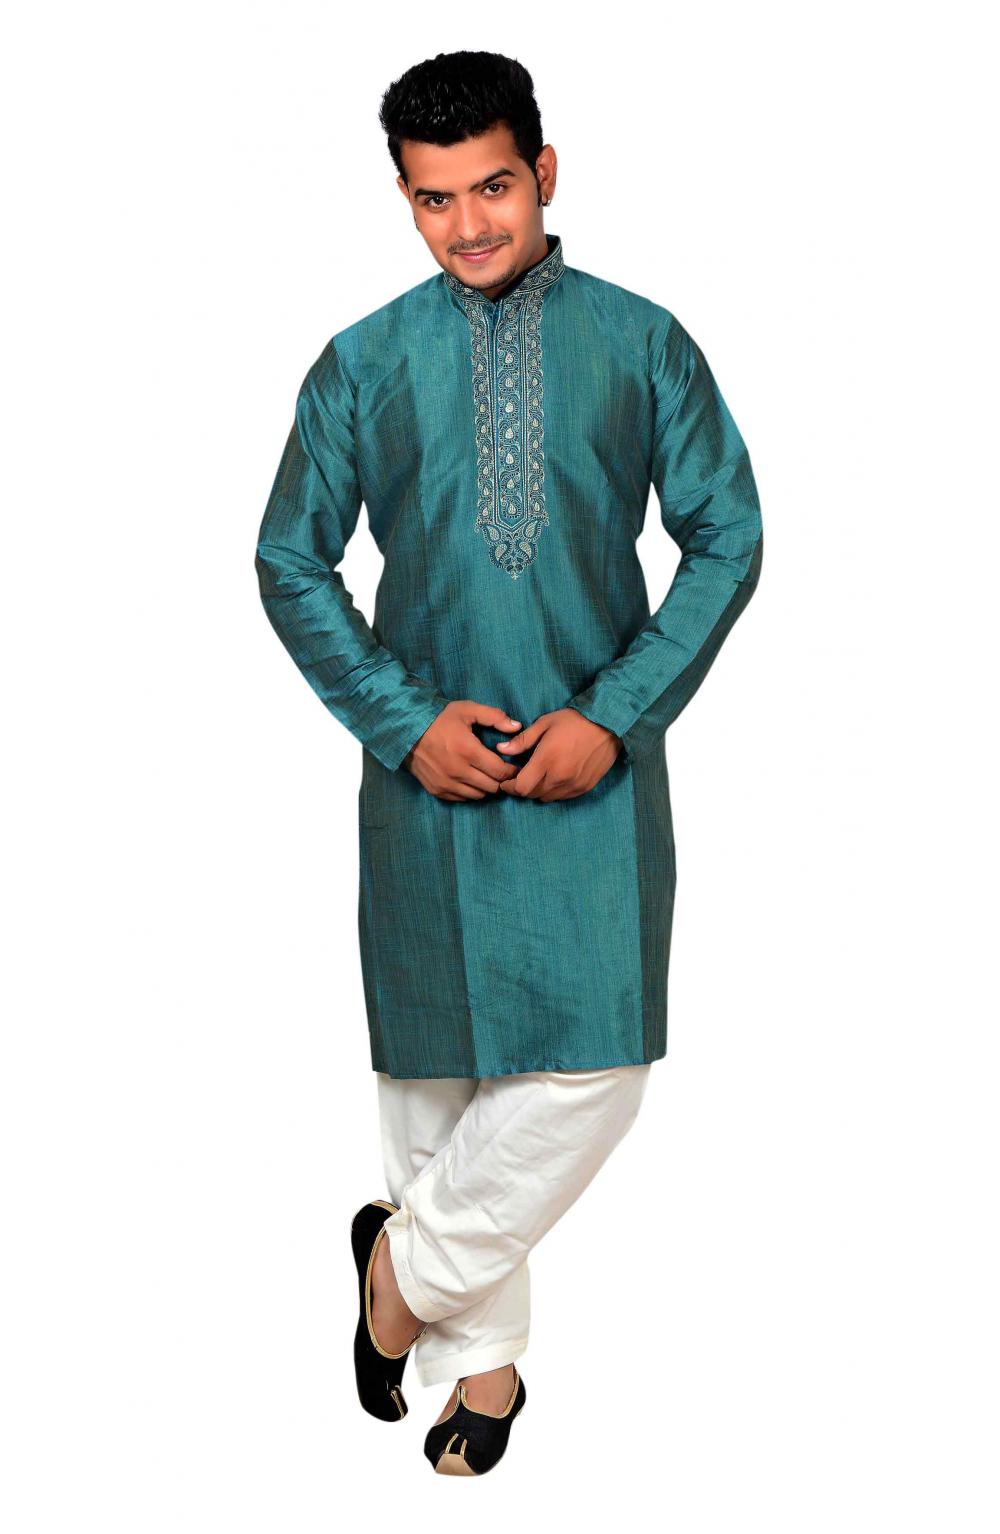 09c612cae2 Mens Indian Bollywood wedding Sherwani - Kurta Shalwar Kameez shop UK